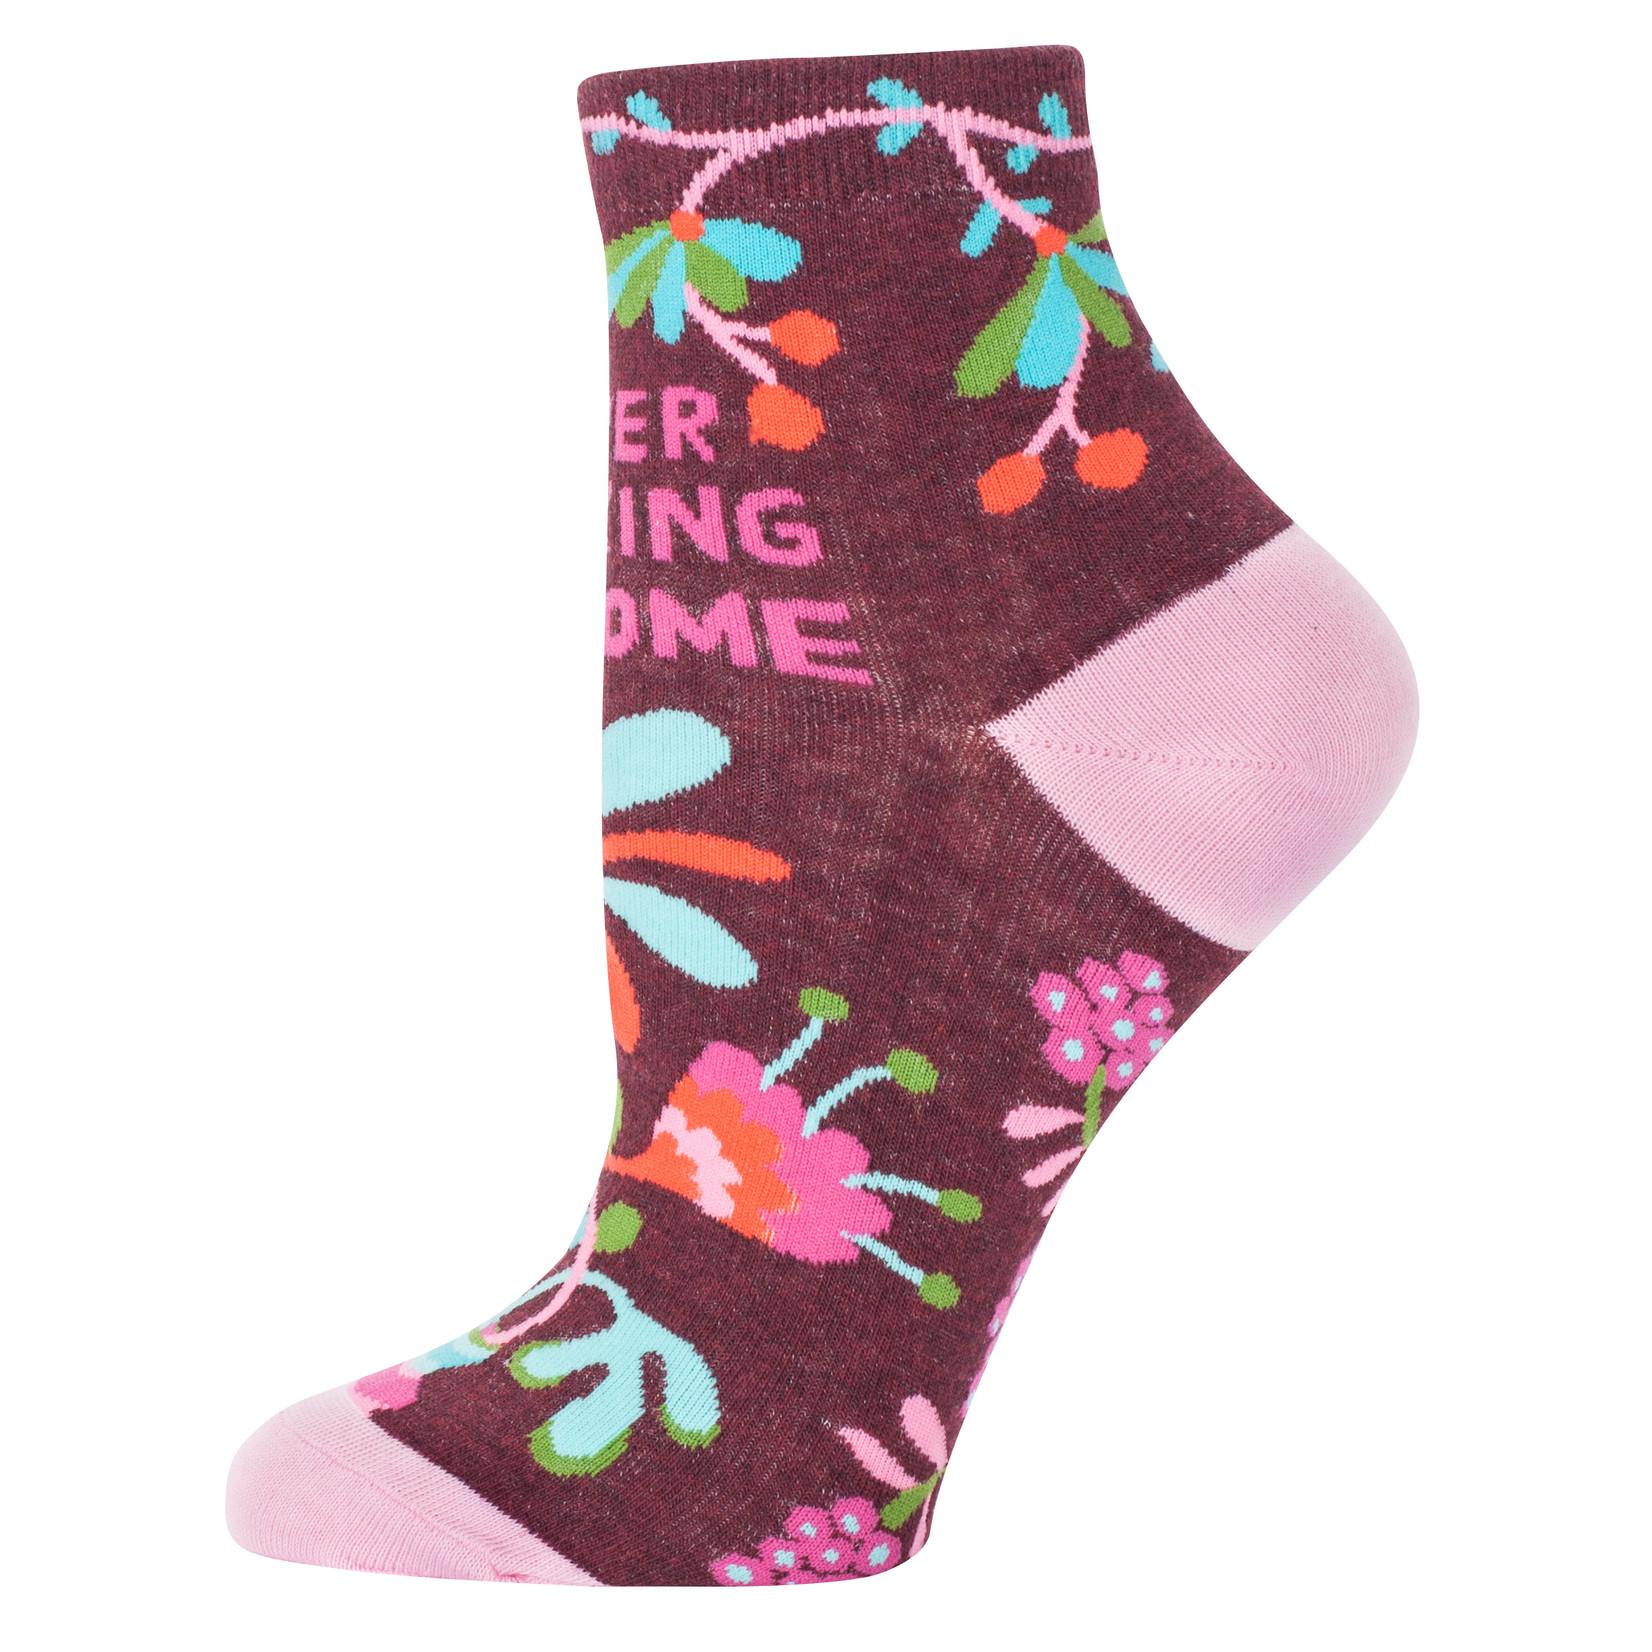 Blue Q Super F*cking Awesome W - Ankle Socks